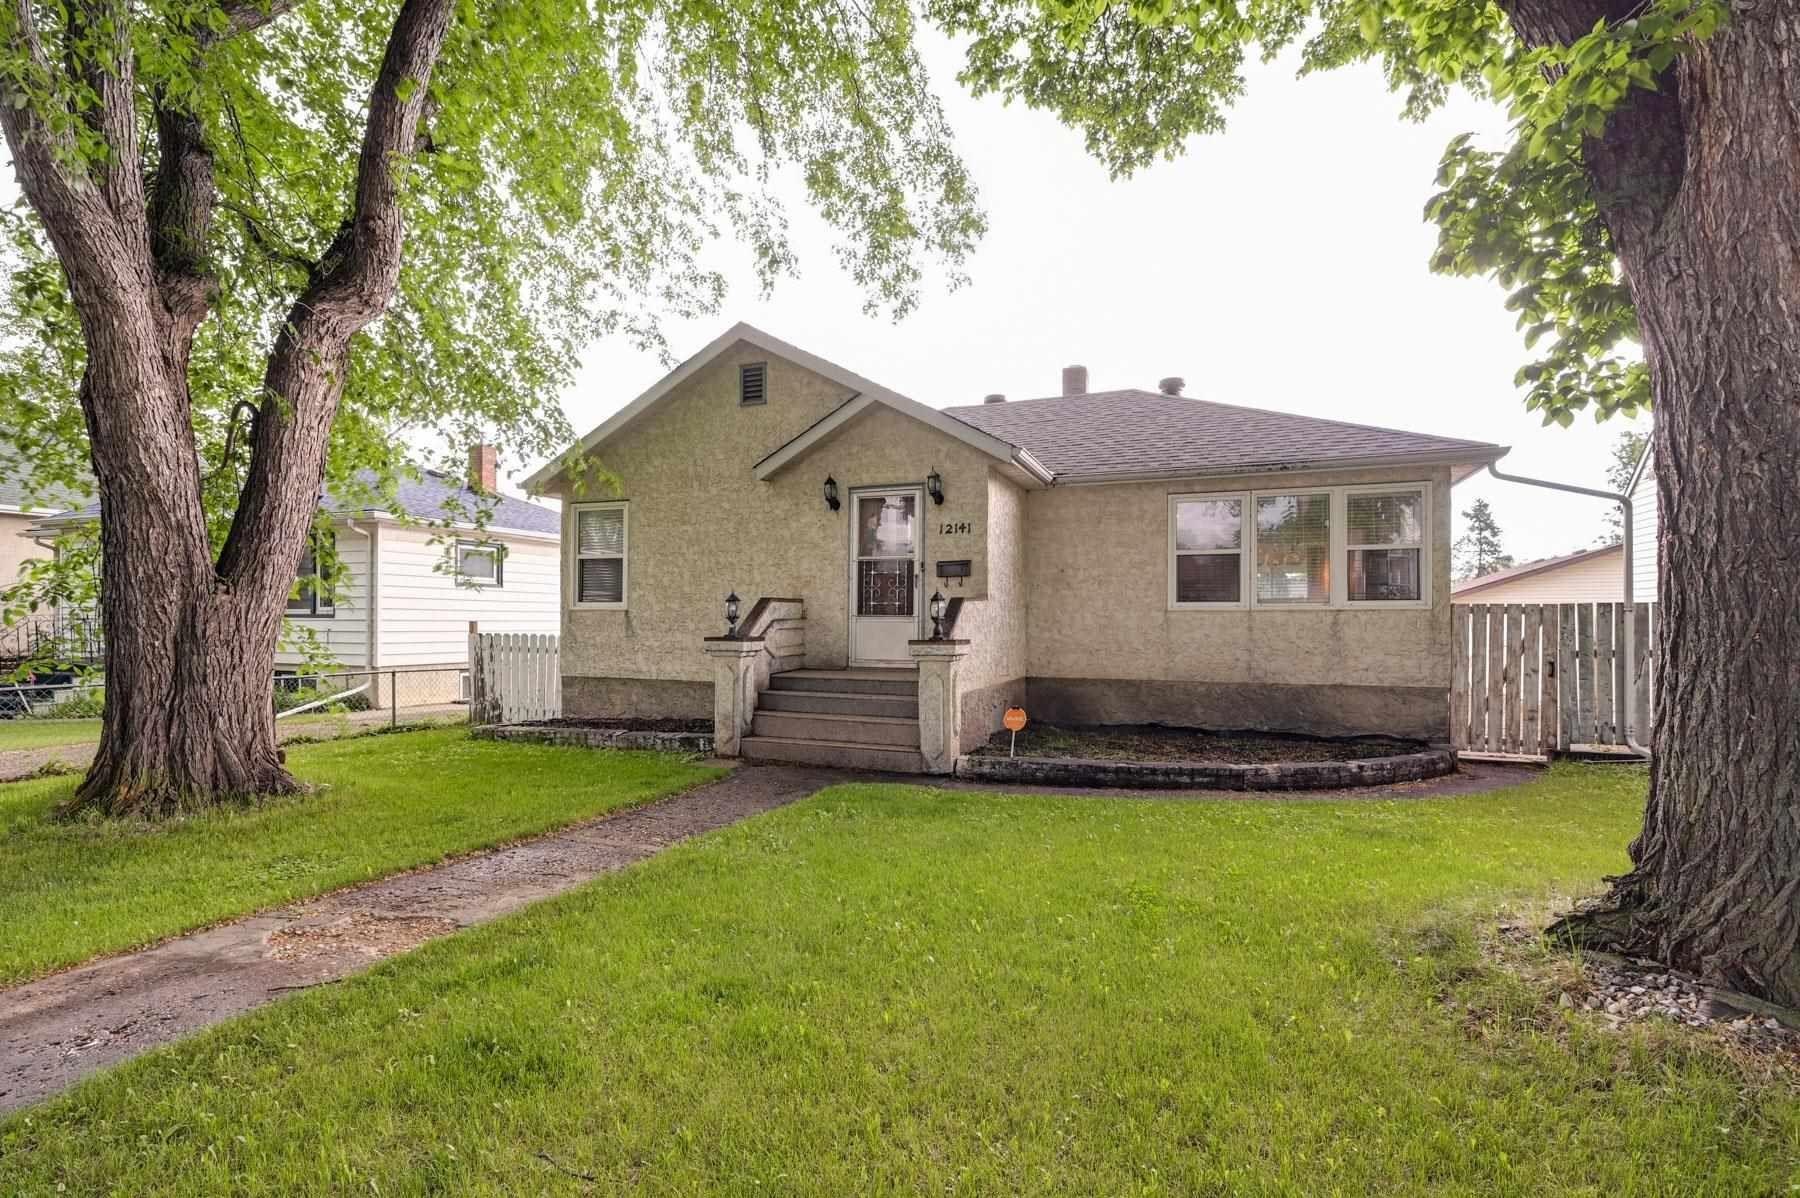 Main Photo: 12141 101 Street in Edmonton: Zone 08 House for sale : MLS®# E4249949